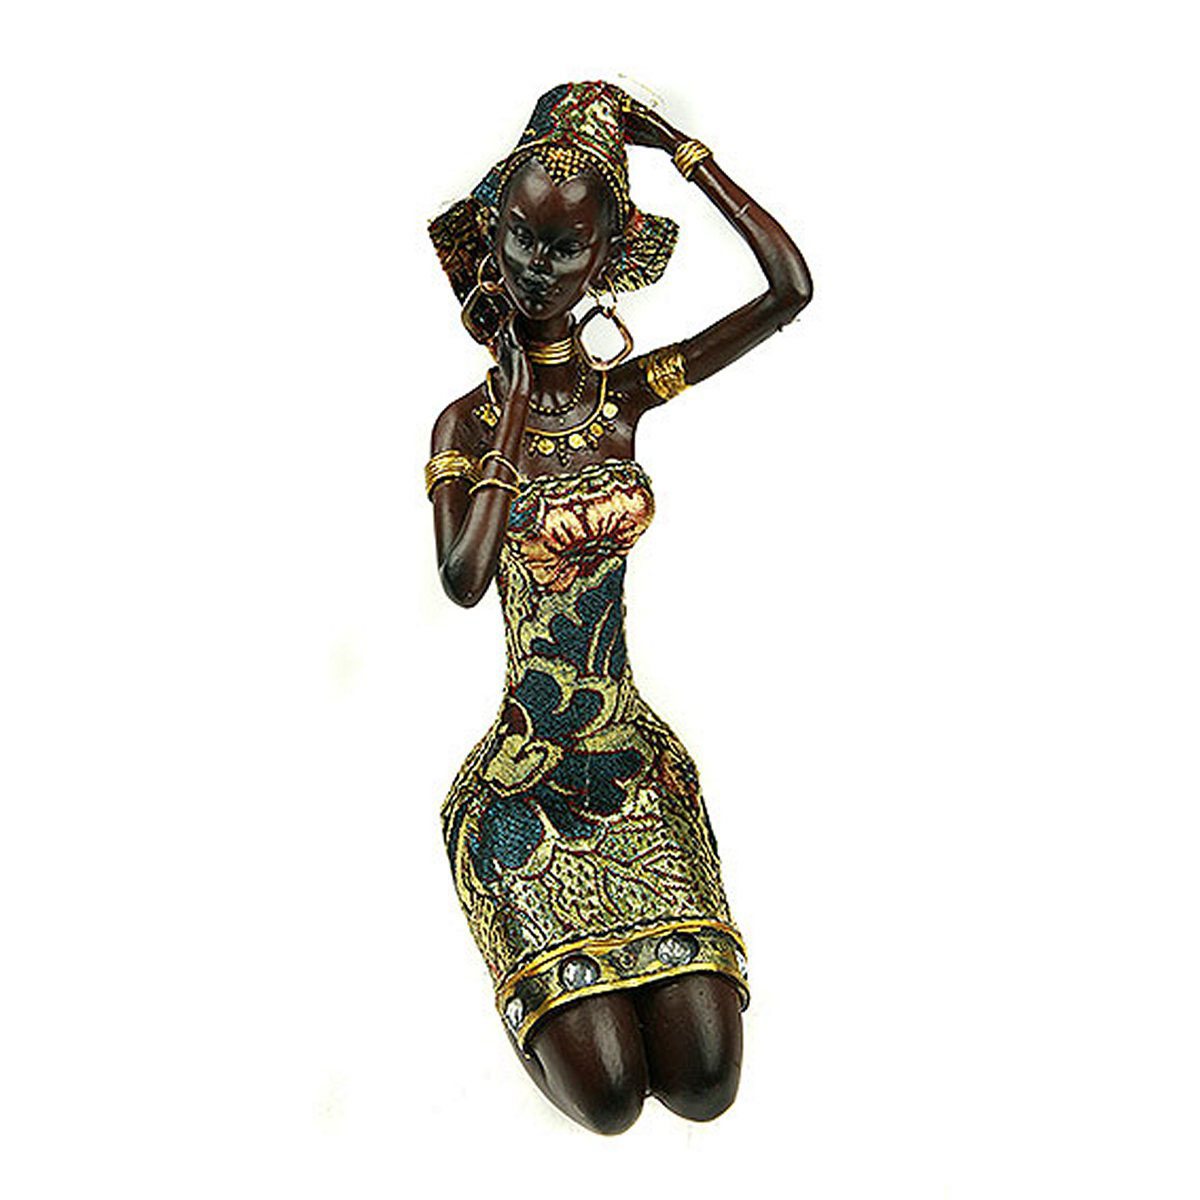 Статуэтка Русские Подарки Африканка, 12 х 12 х 23 см статуэтка русские подарки африканка 11 х 15 х 24 см